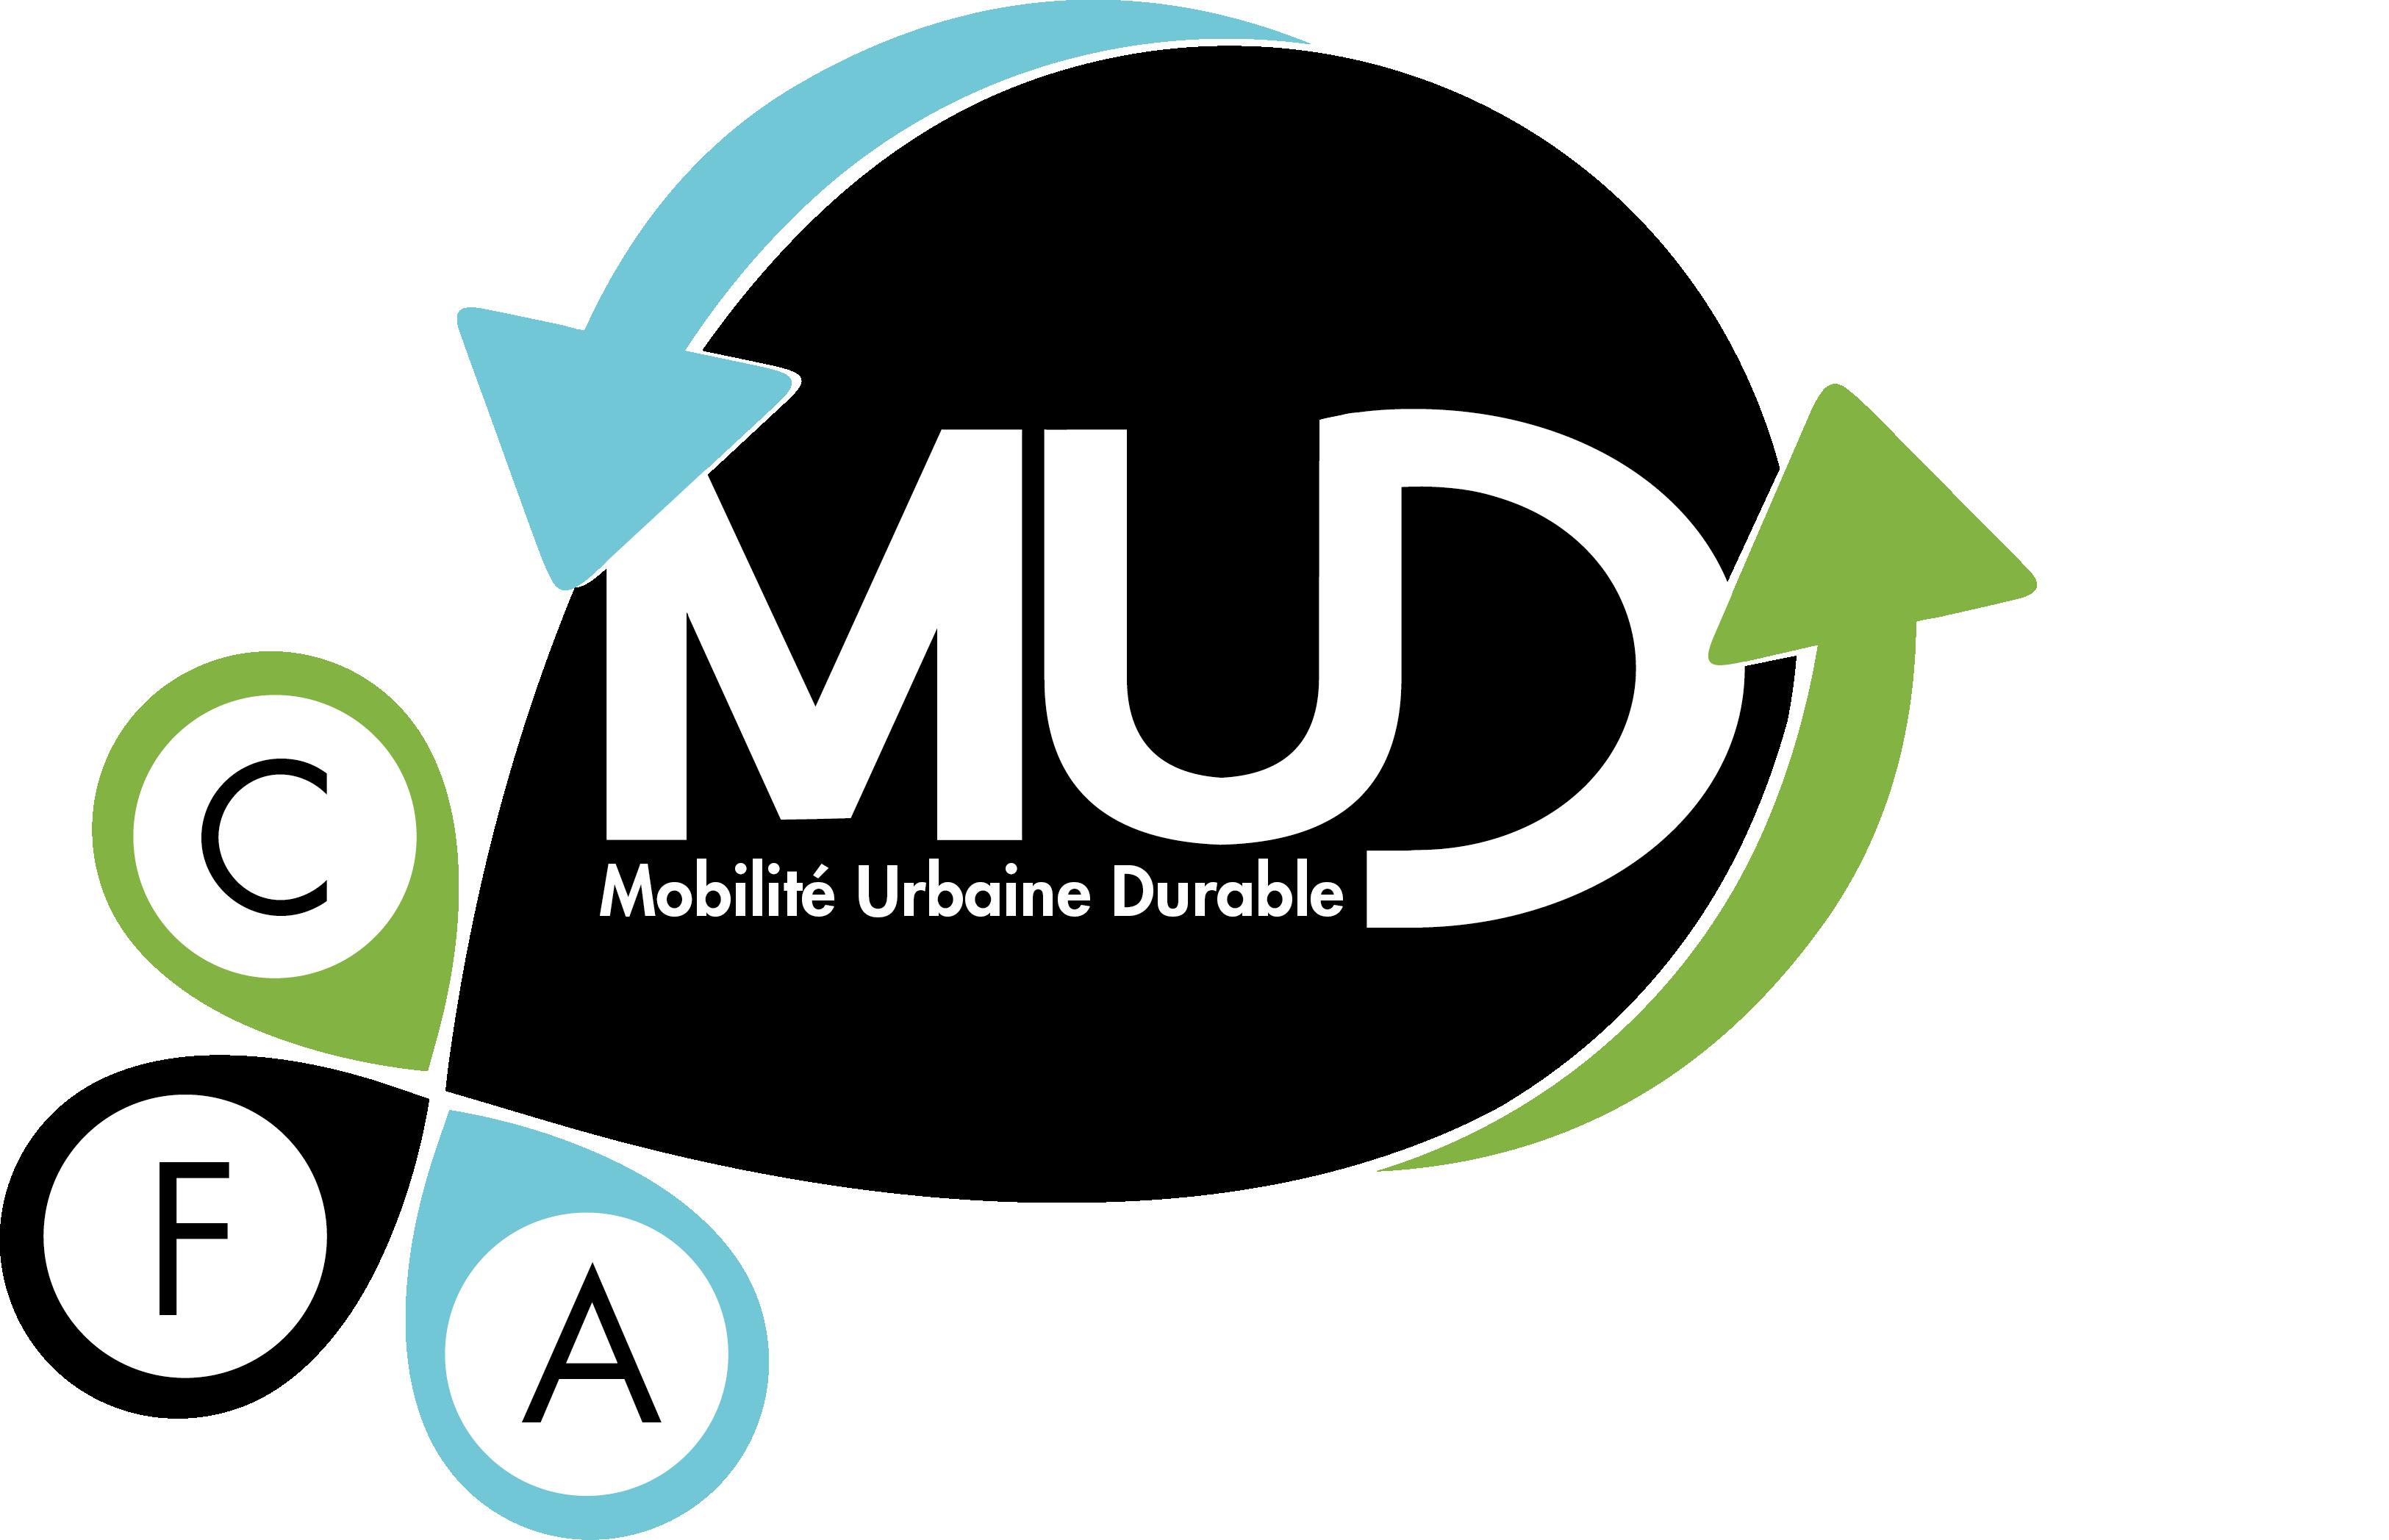 Logo de CFA MOBILITE URBAINE DURABLE